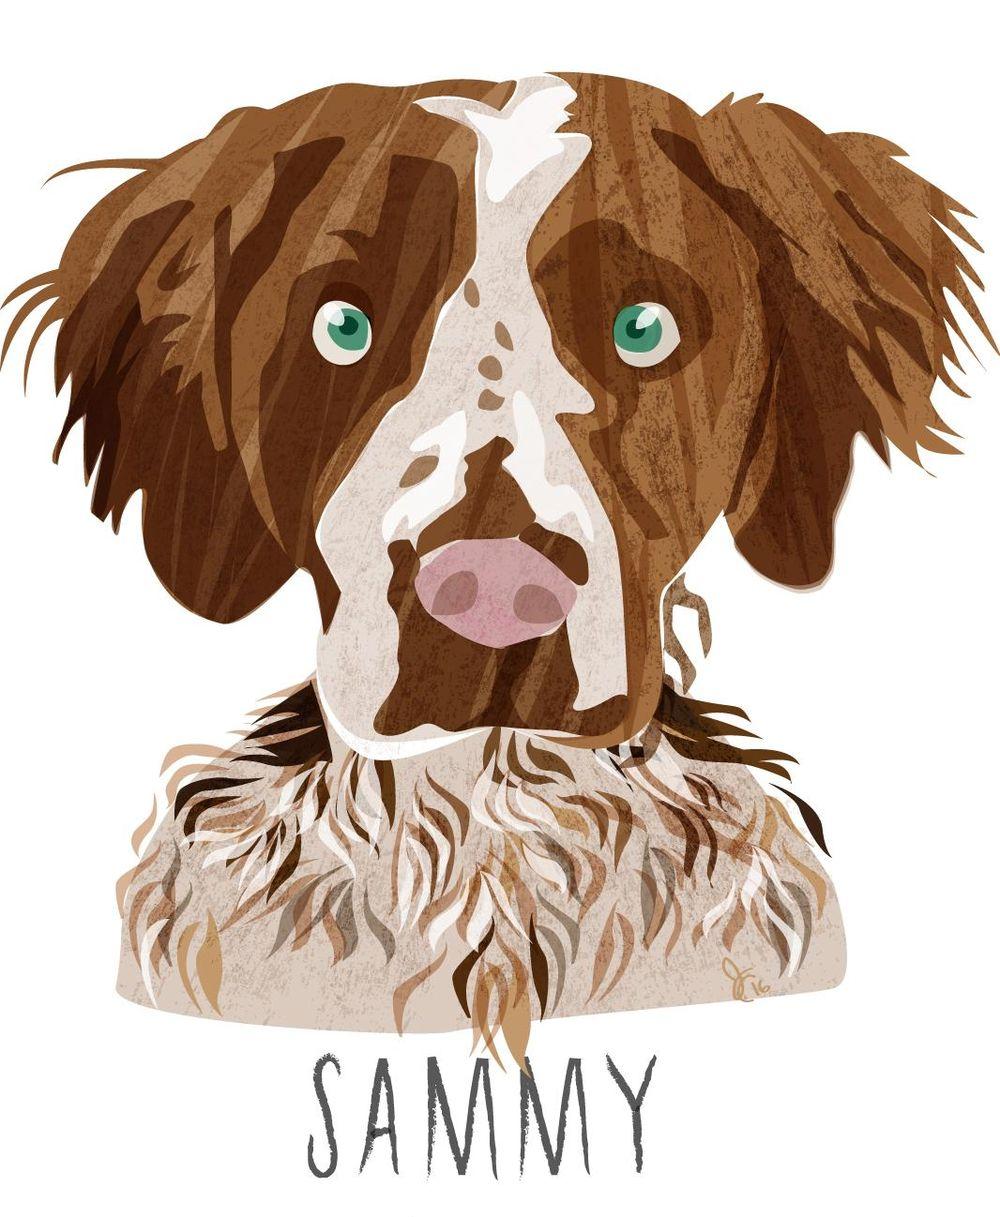 Sammy - image 1 - student project